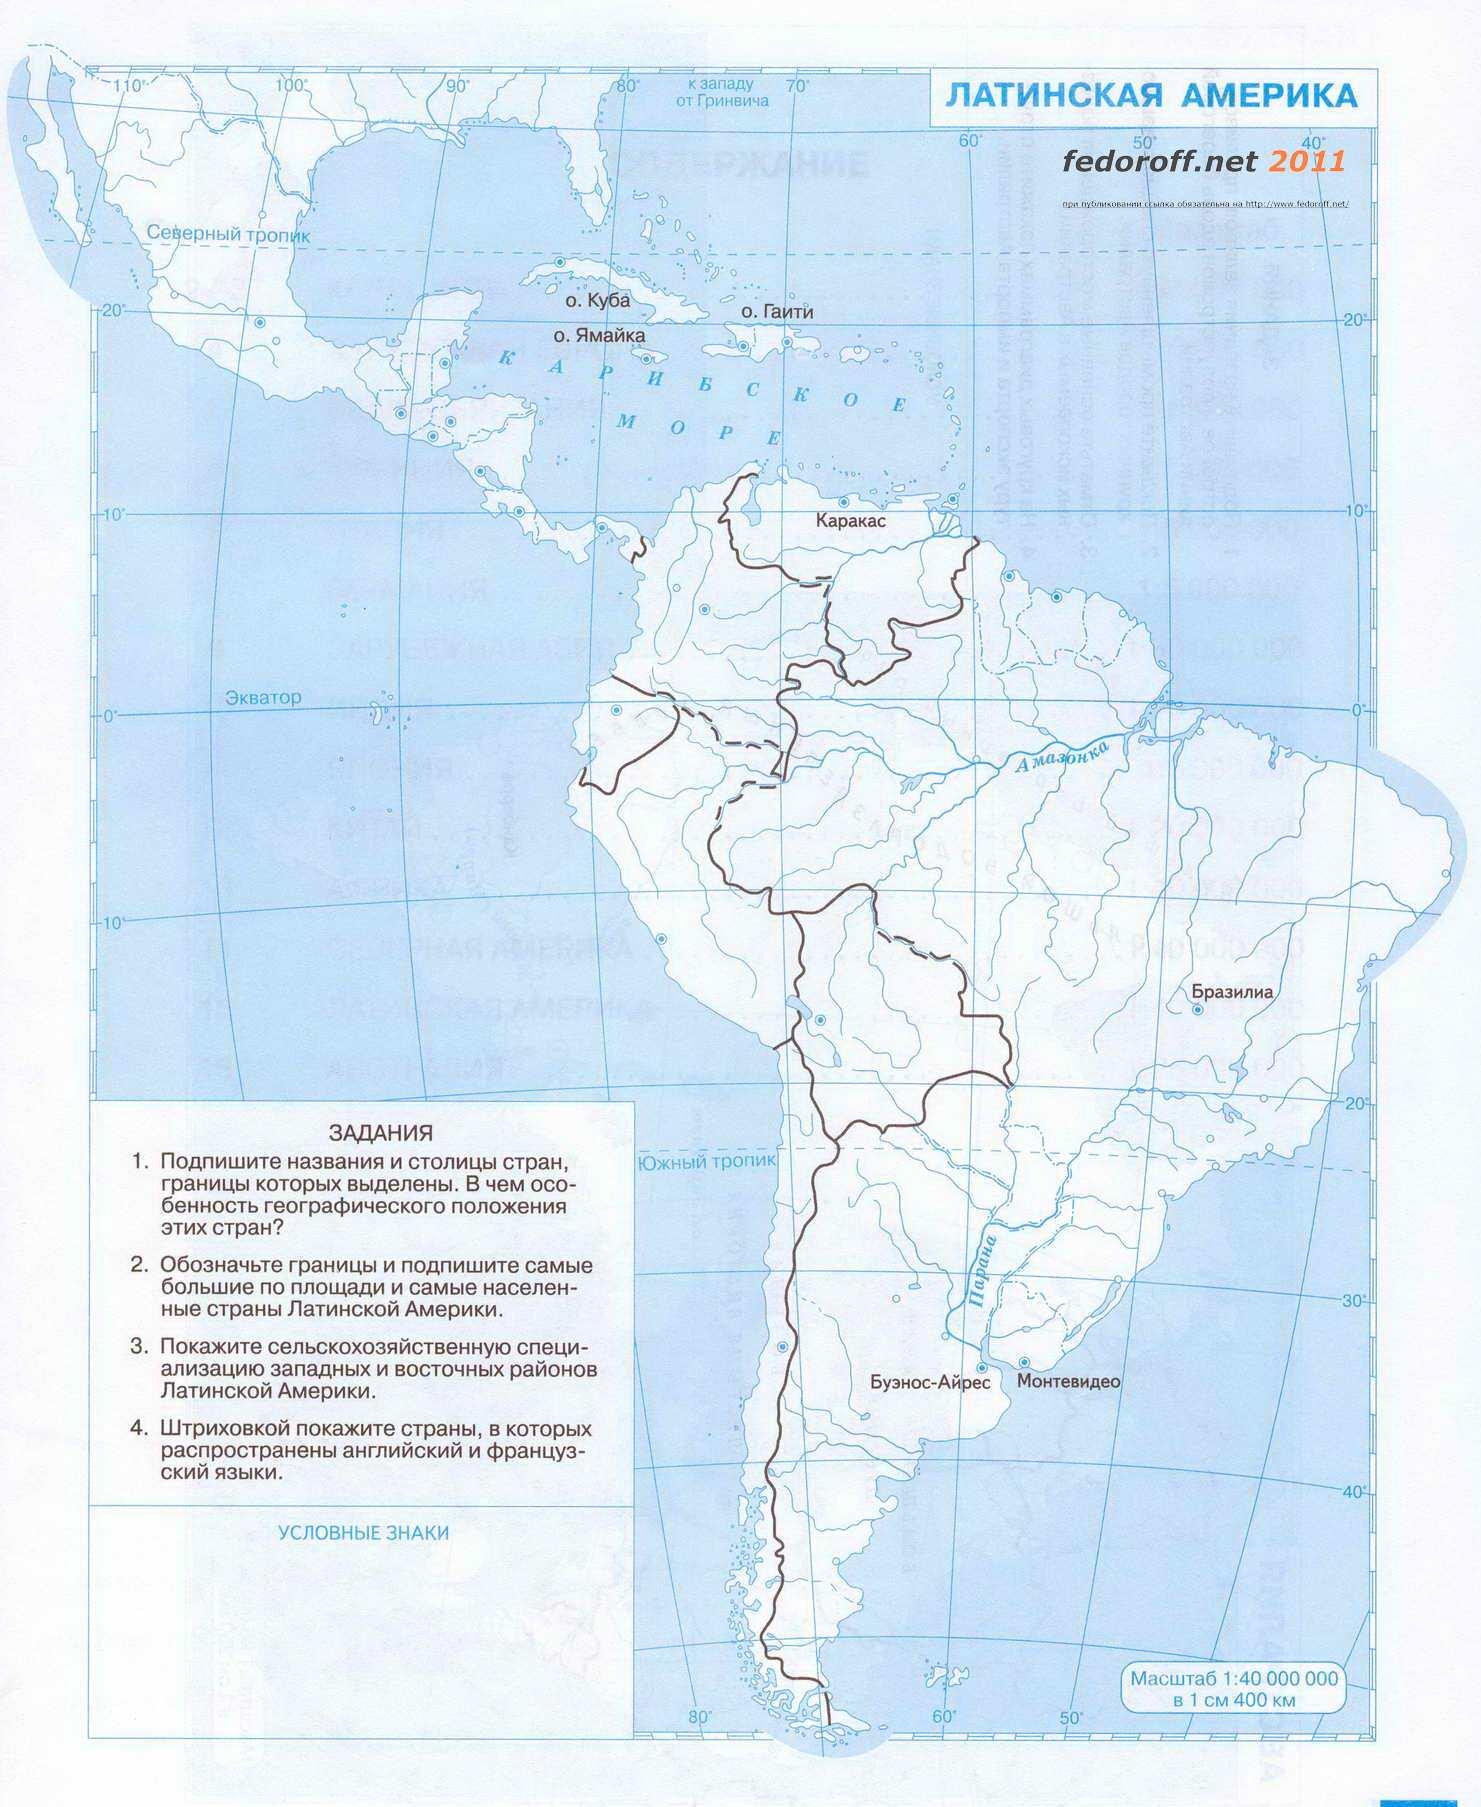 Гдз карта латинская америка